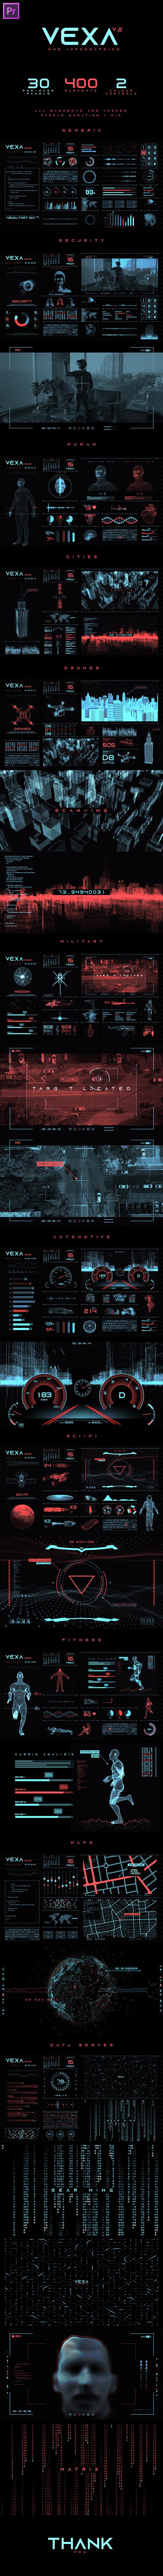 Vexa HUD Infographics Essential Graphics   Mogrt - 8